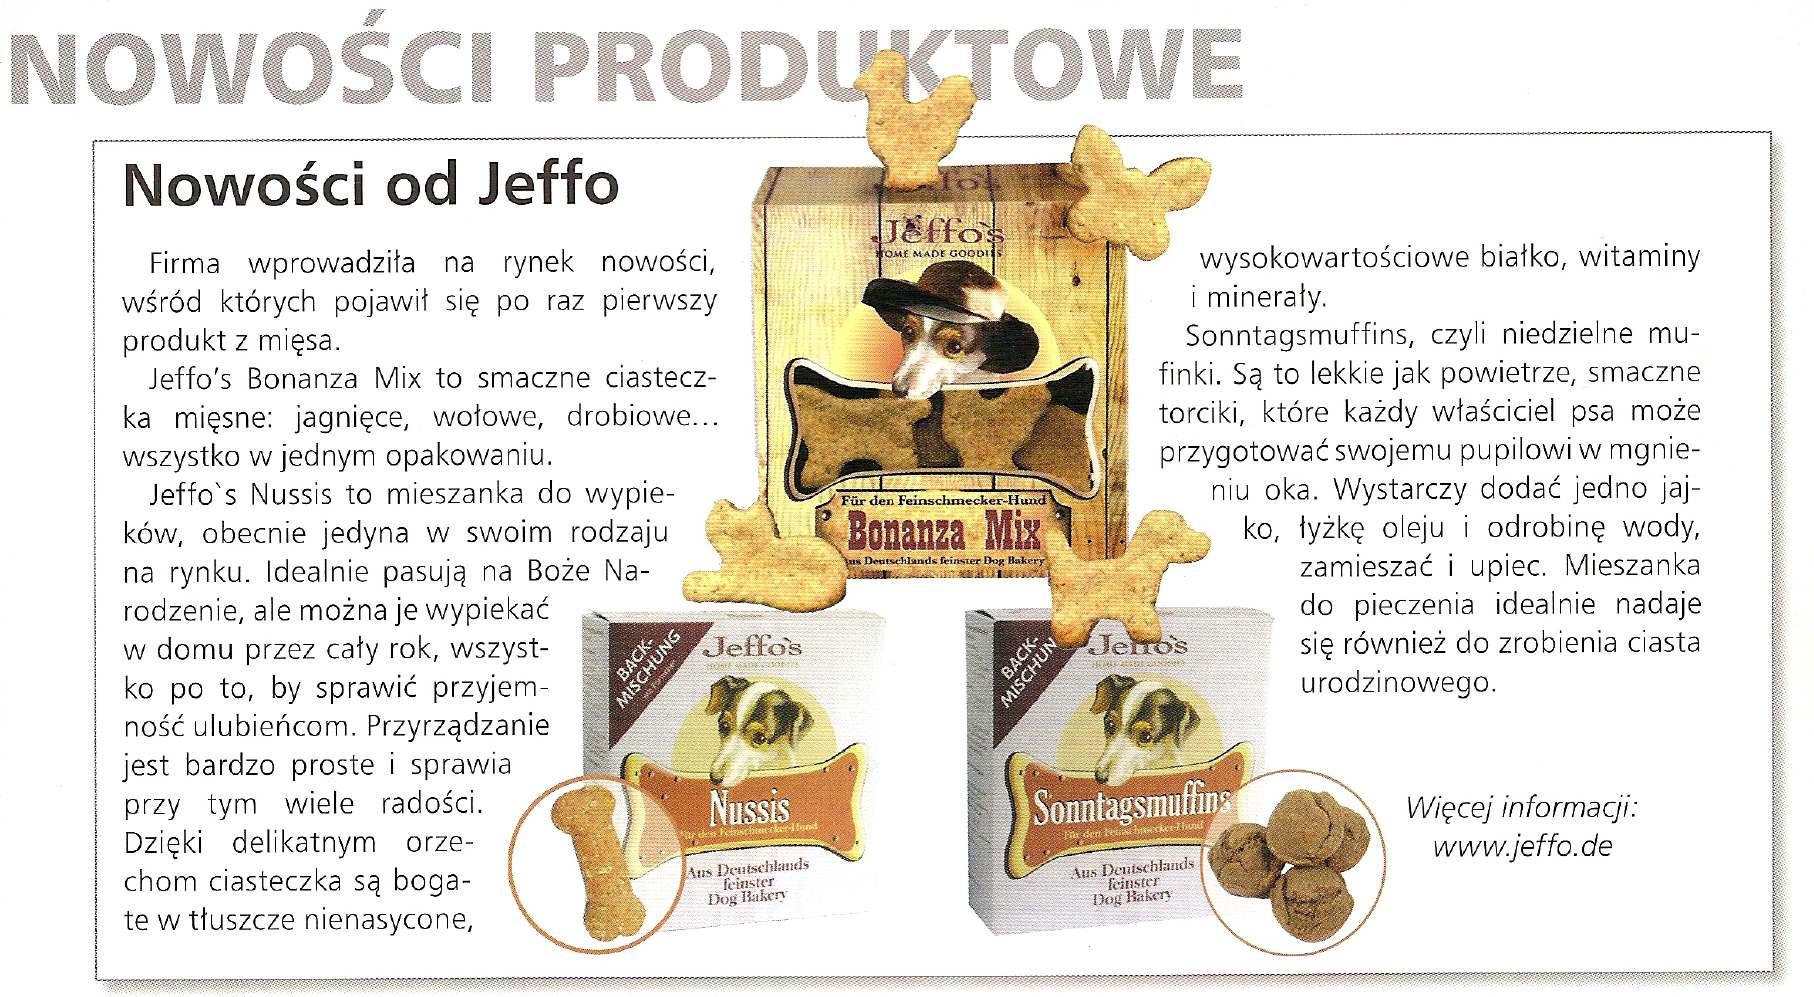 Presseschau Petmarket czerwiec 12-2007